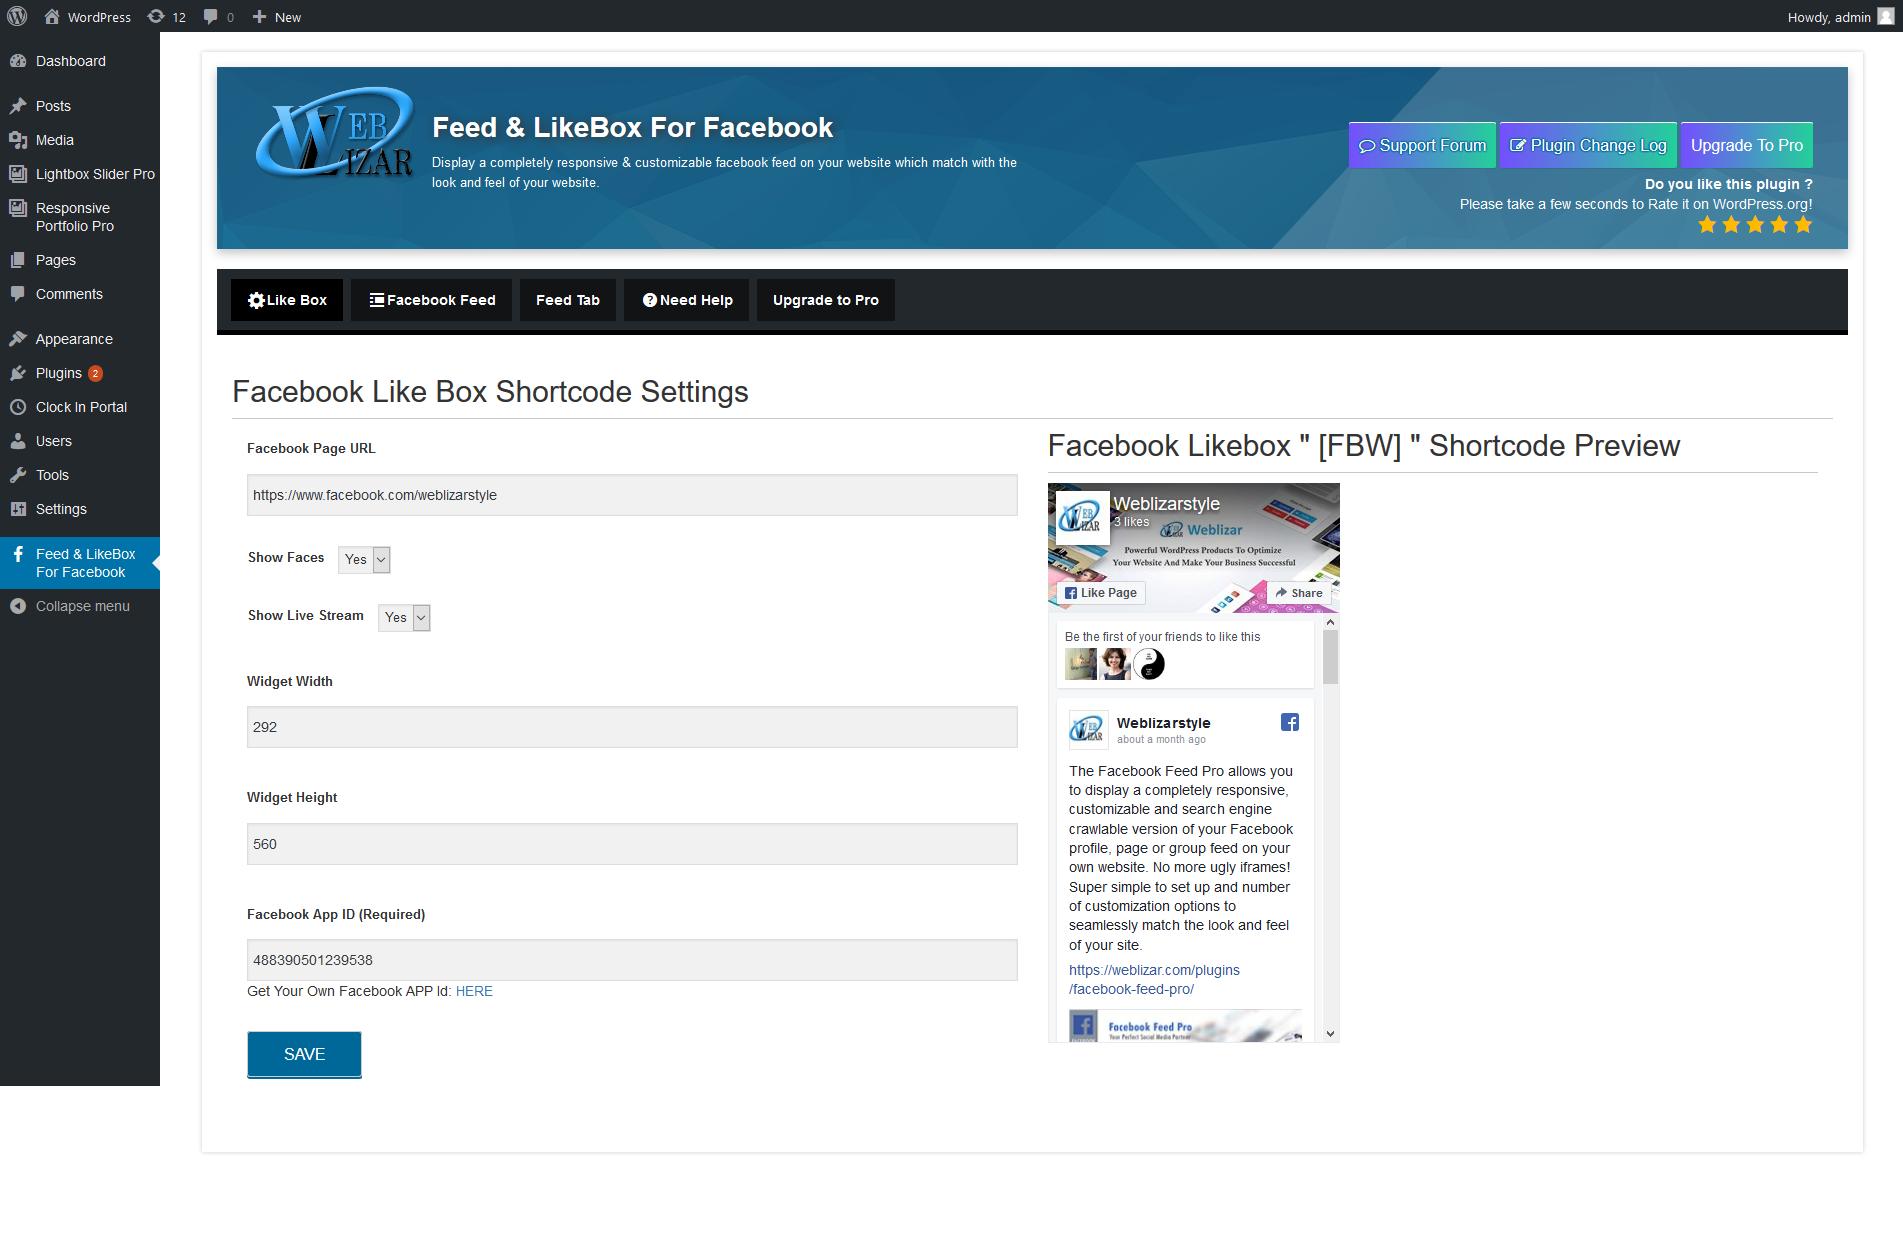 Feed & LikeBox For Facebook Download Free Wordpress Plugin 2